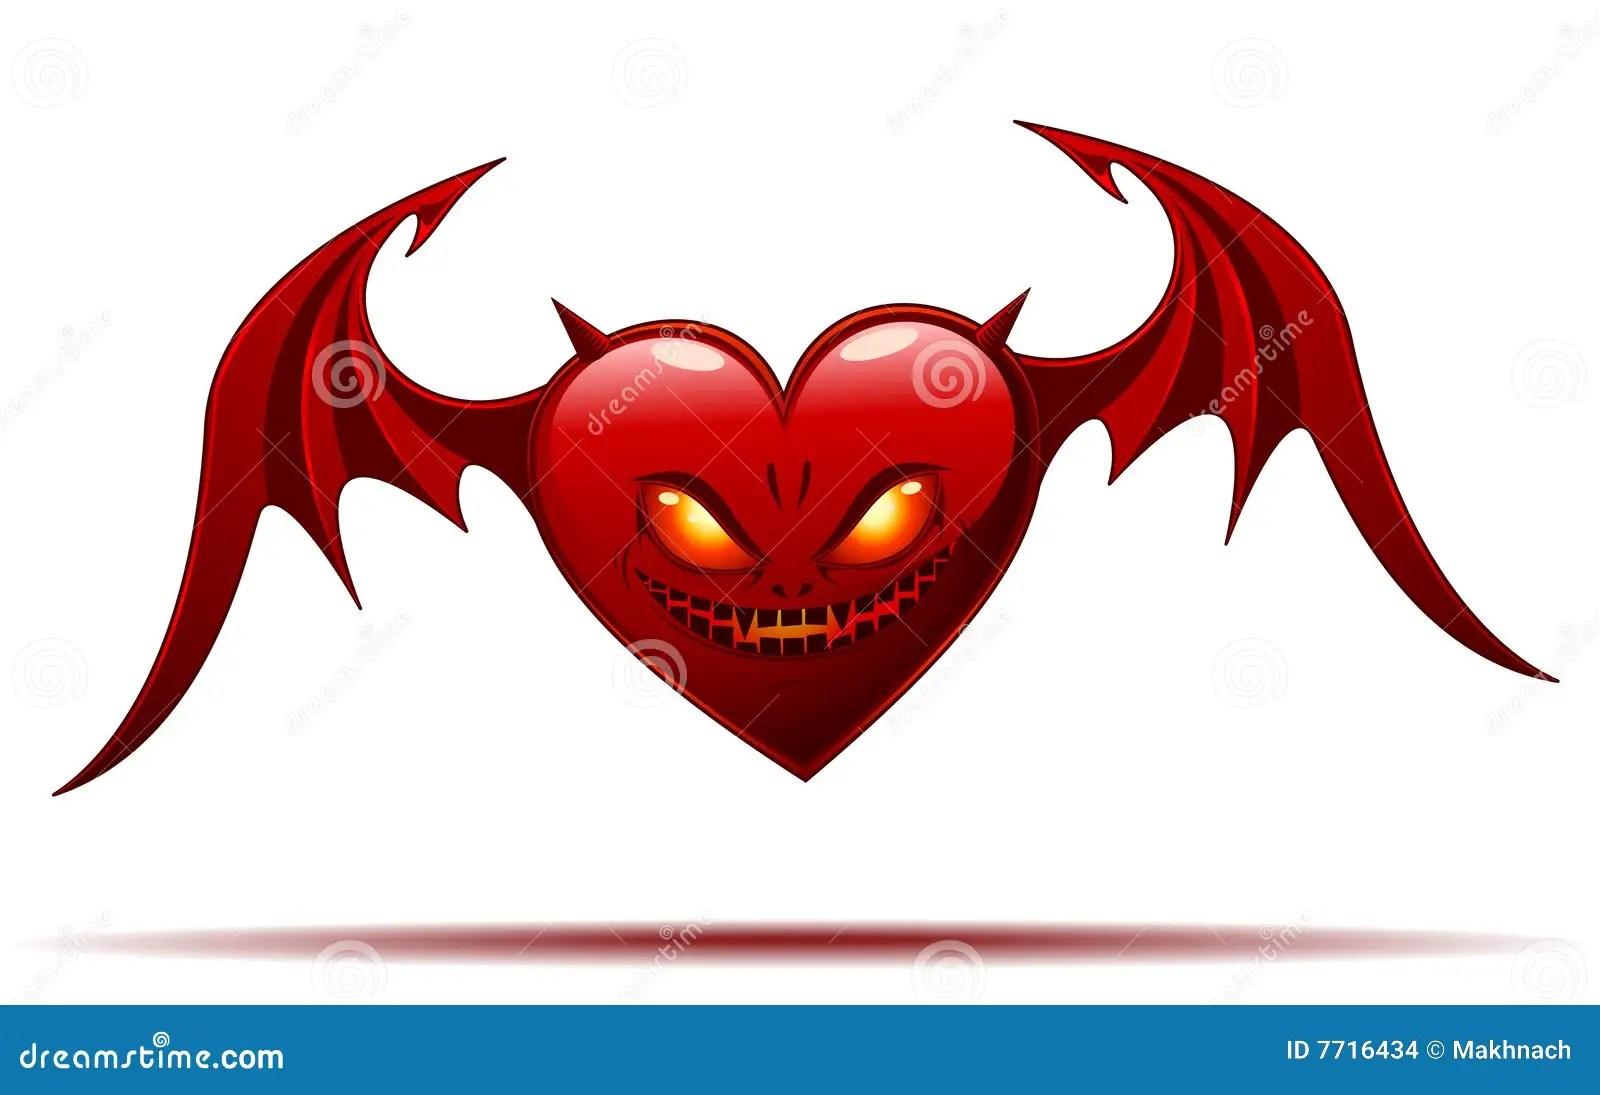 Heart Wings Background